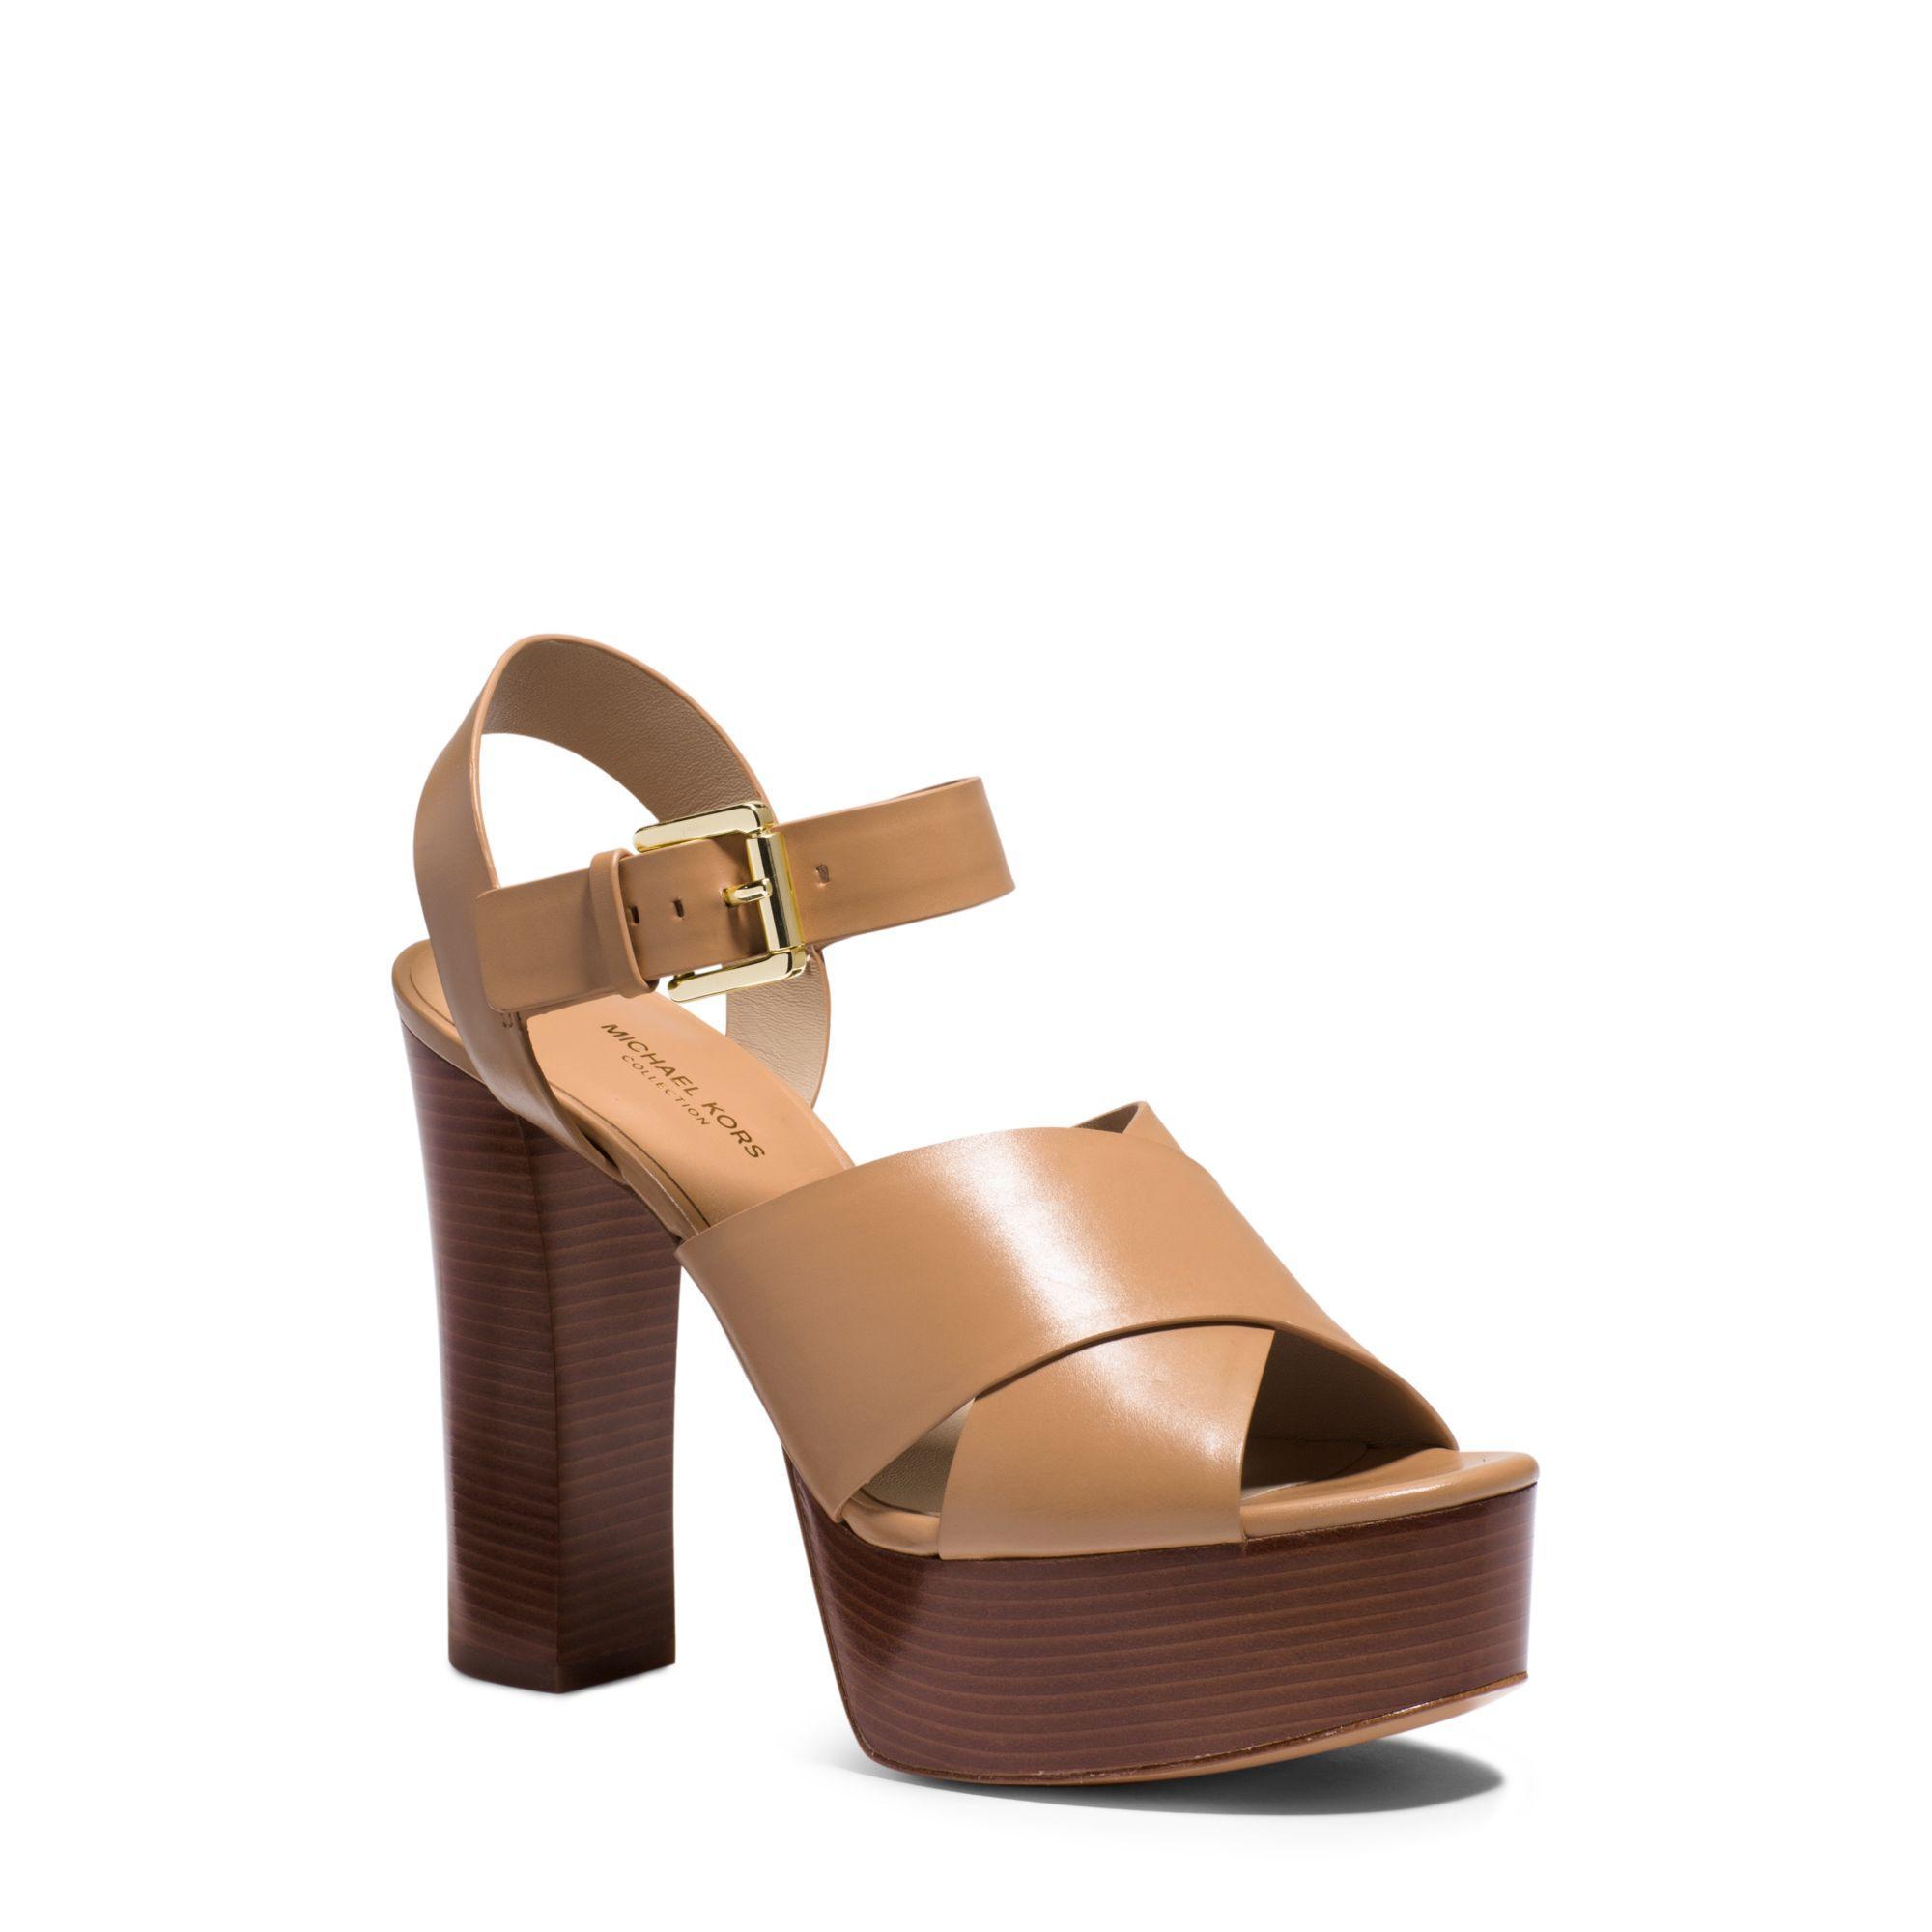 be73999c0c09 Lyst - Michael Kors Dara Leather Platform Sandal in Brown